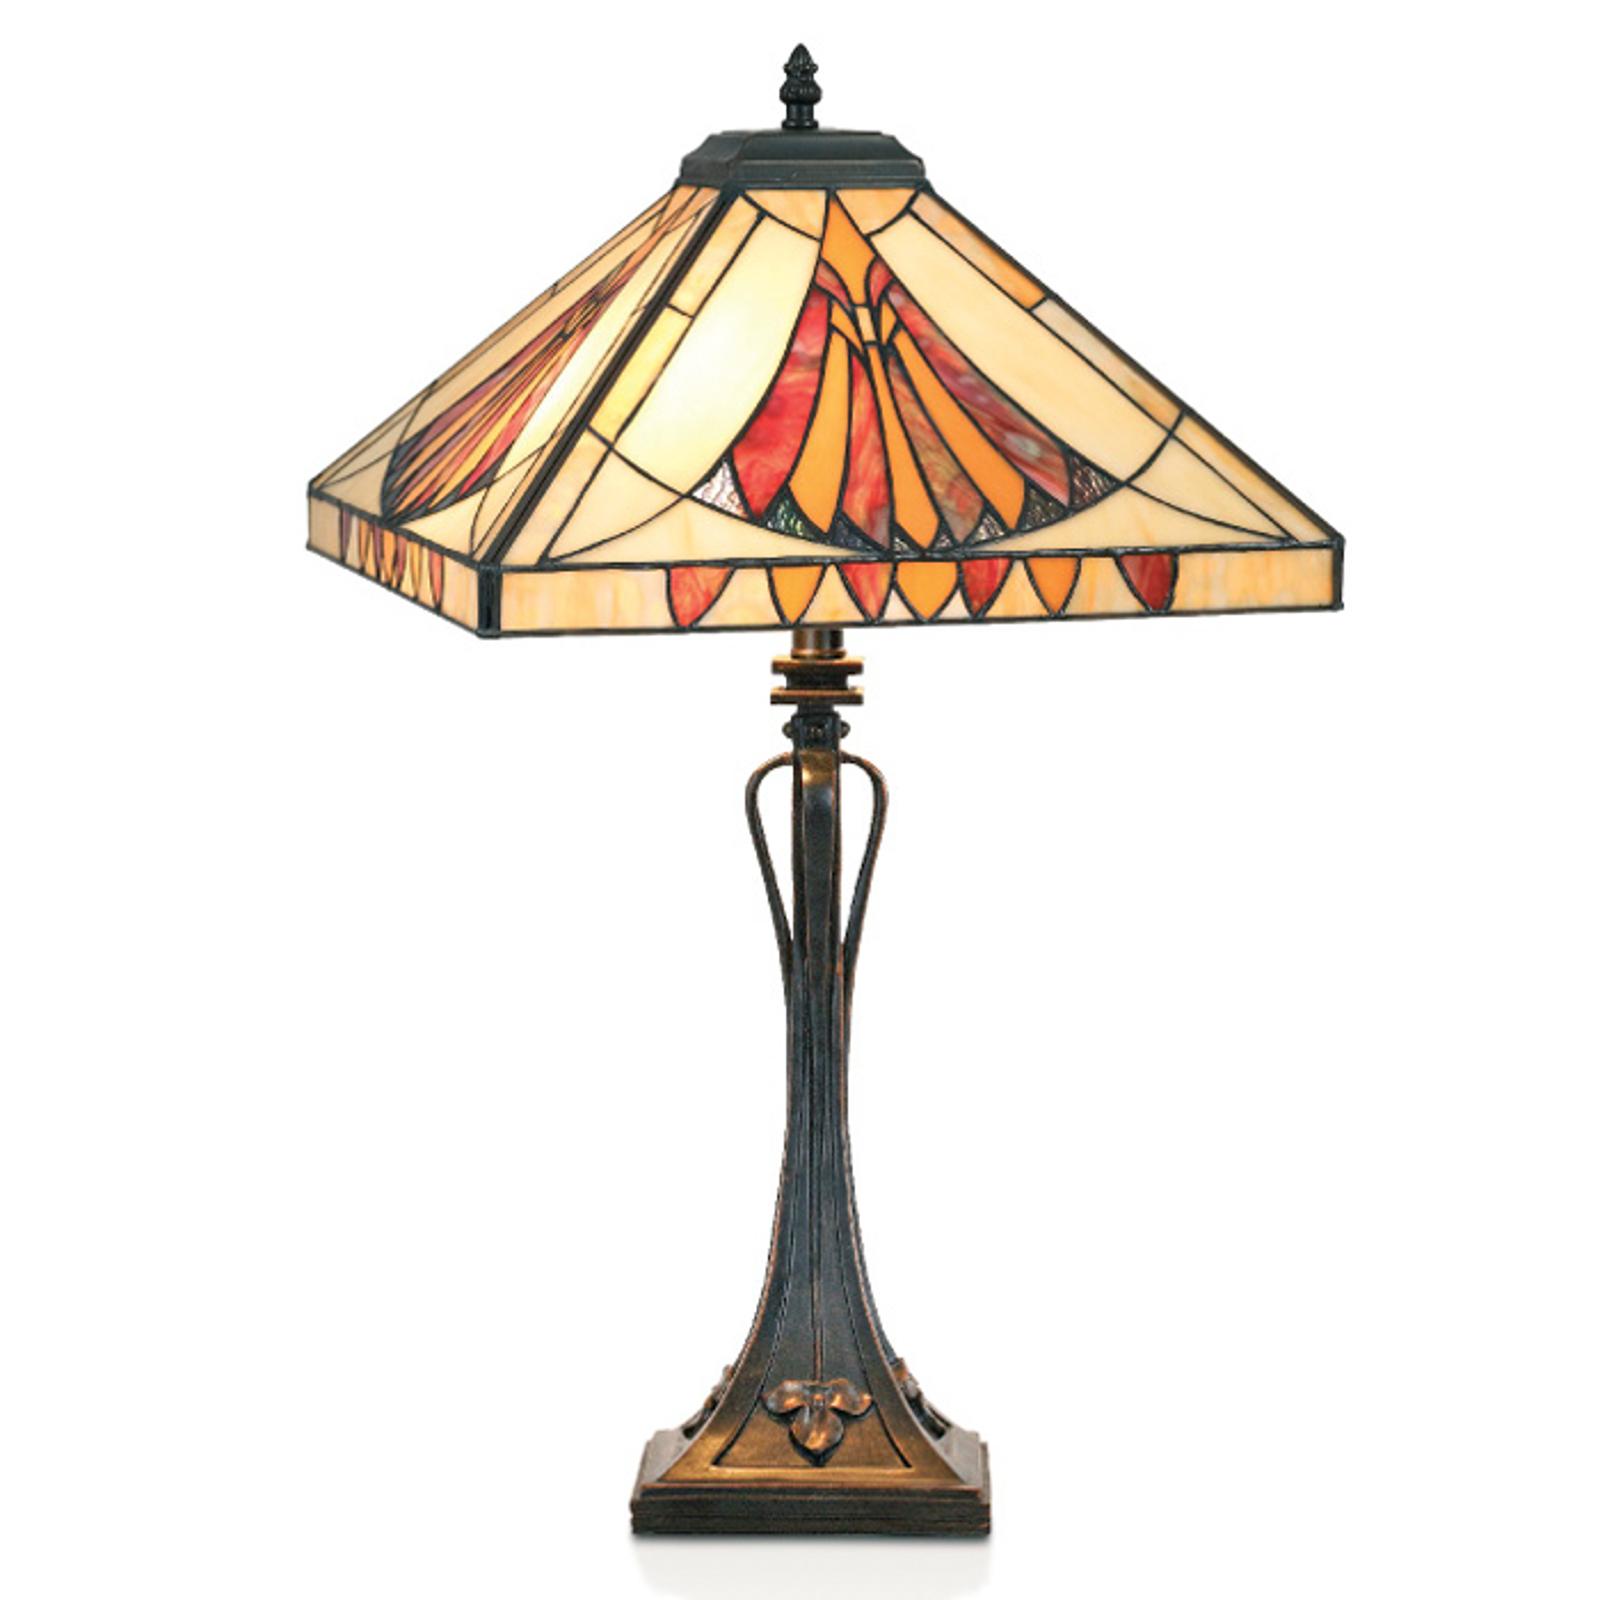 Graceful table lamp AMALIA in the Tiffany style_1032191_1